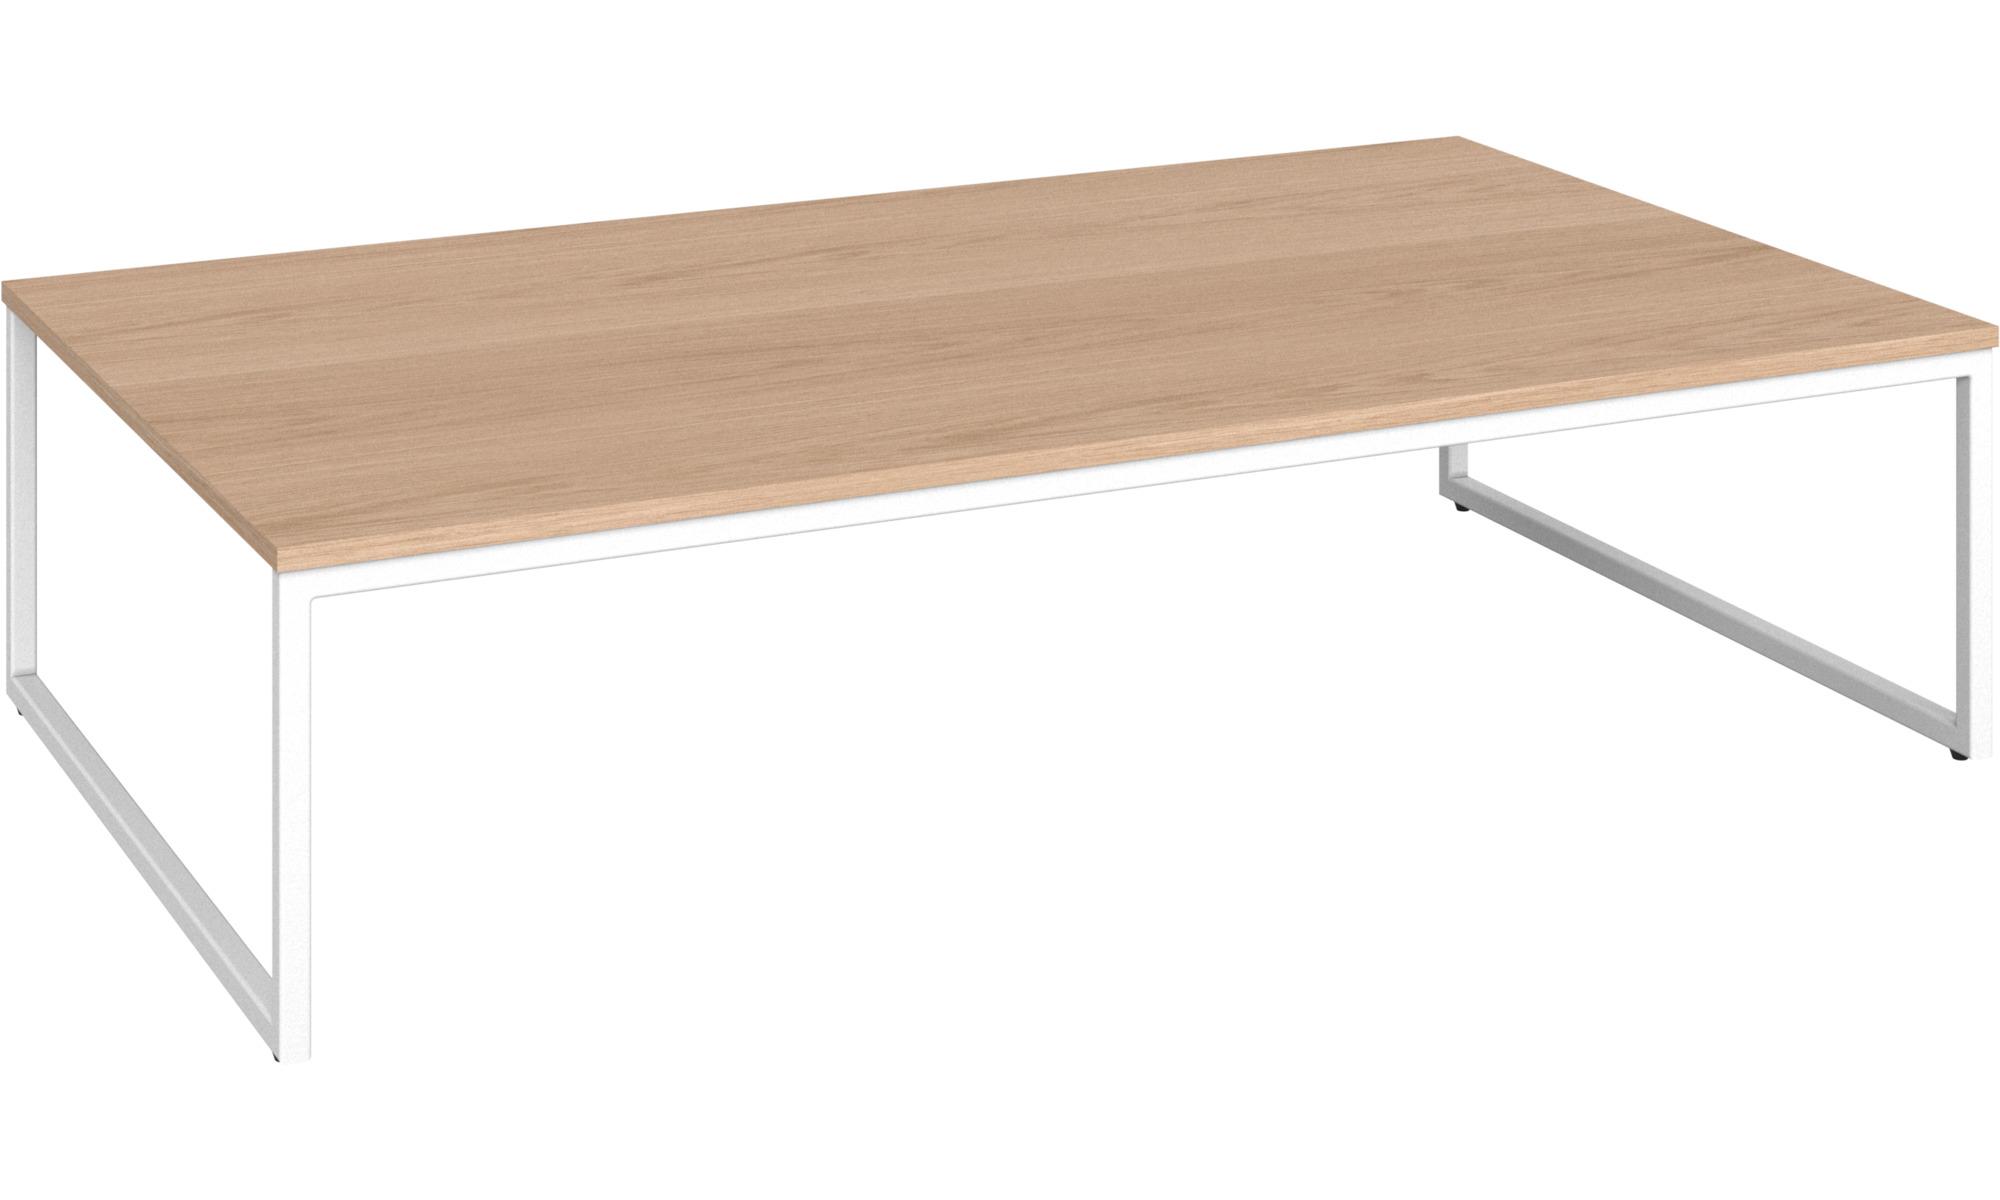 coffee tables lugo coffee table boconcept. Black Bedroom Furniture Sets. Home Design Ideas